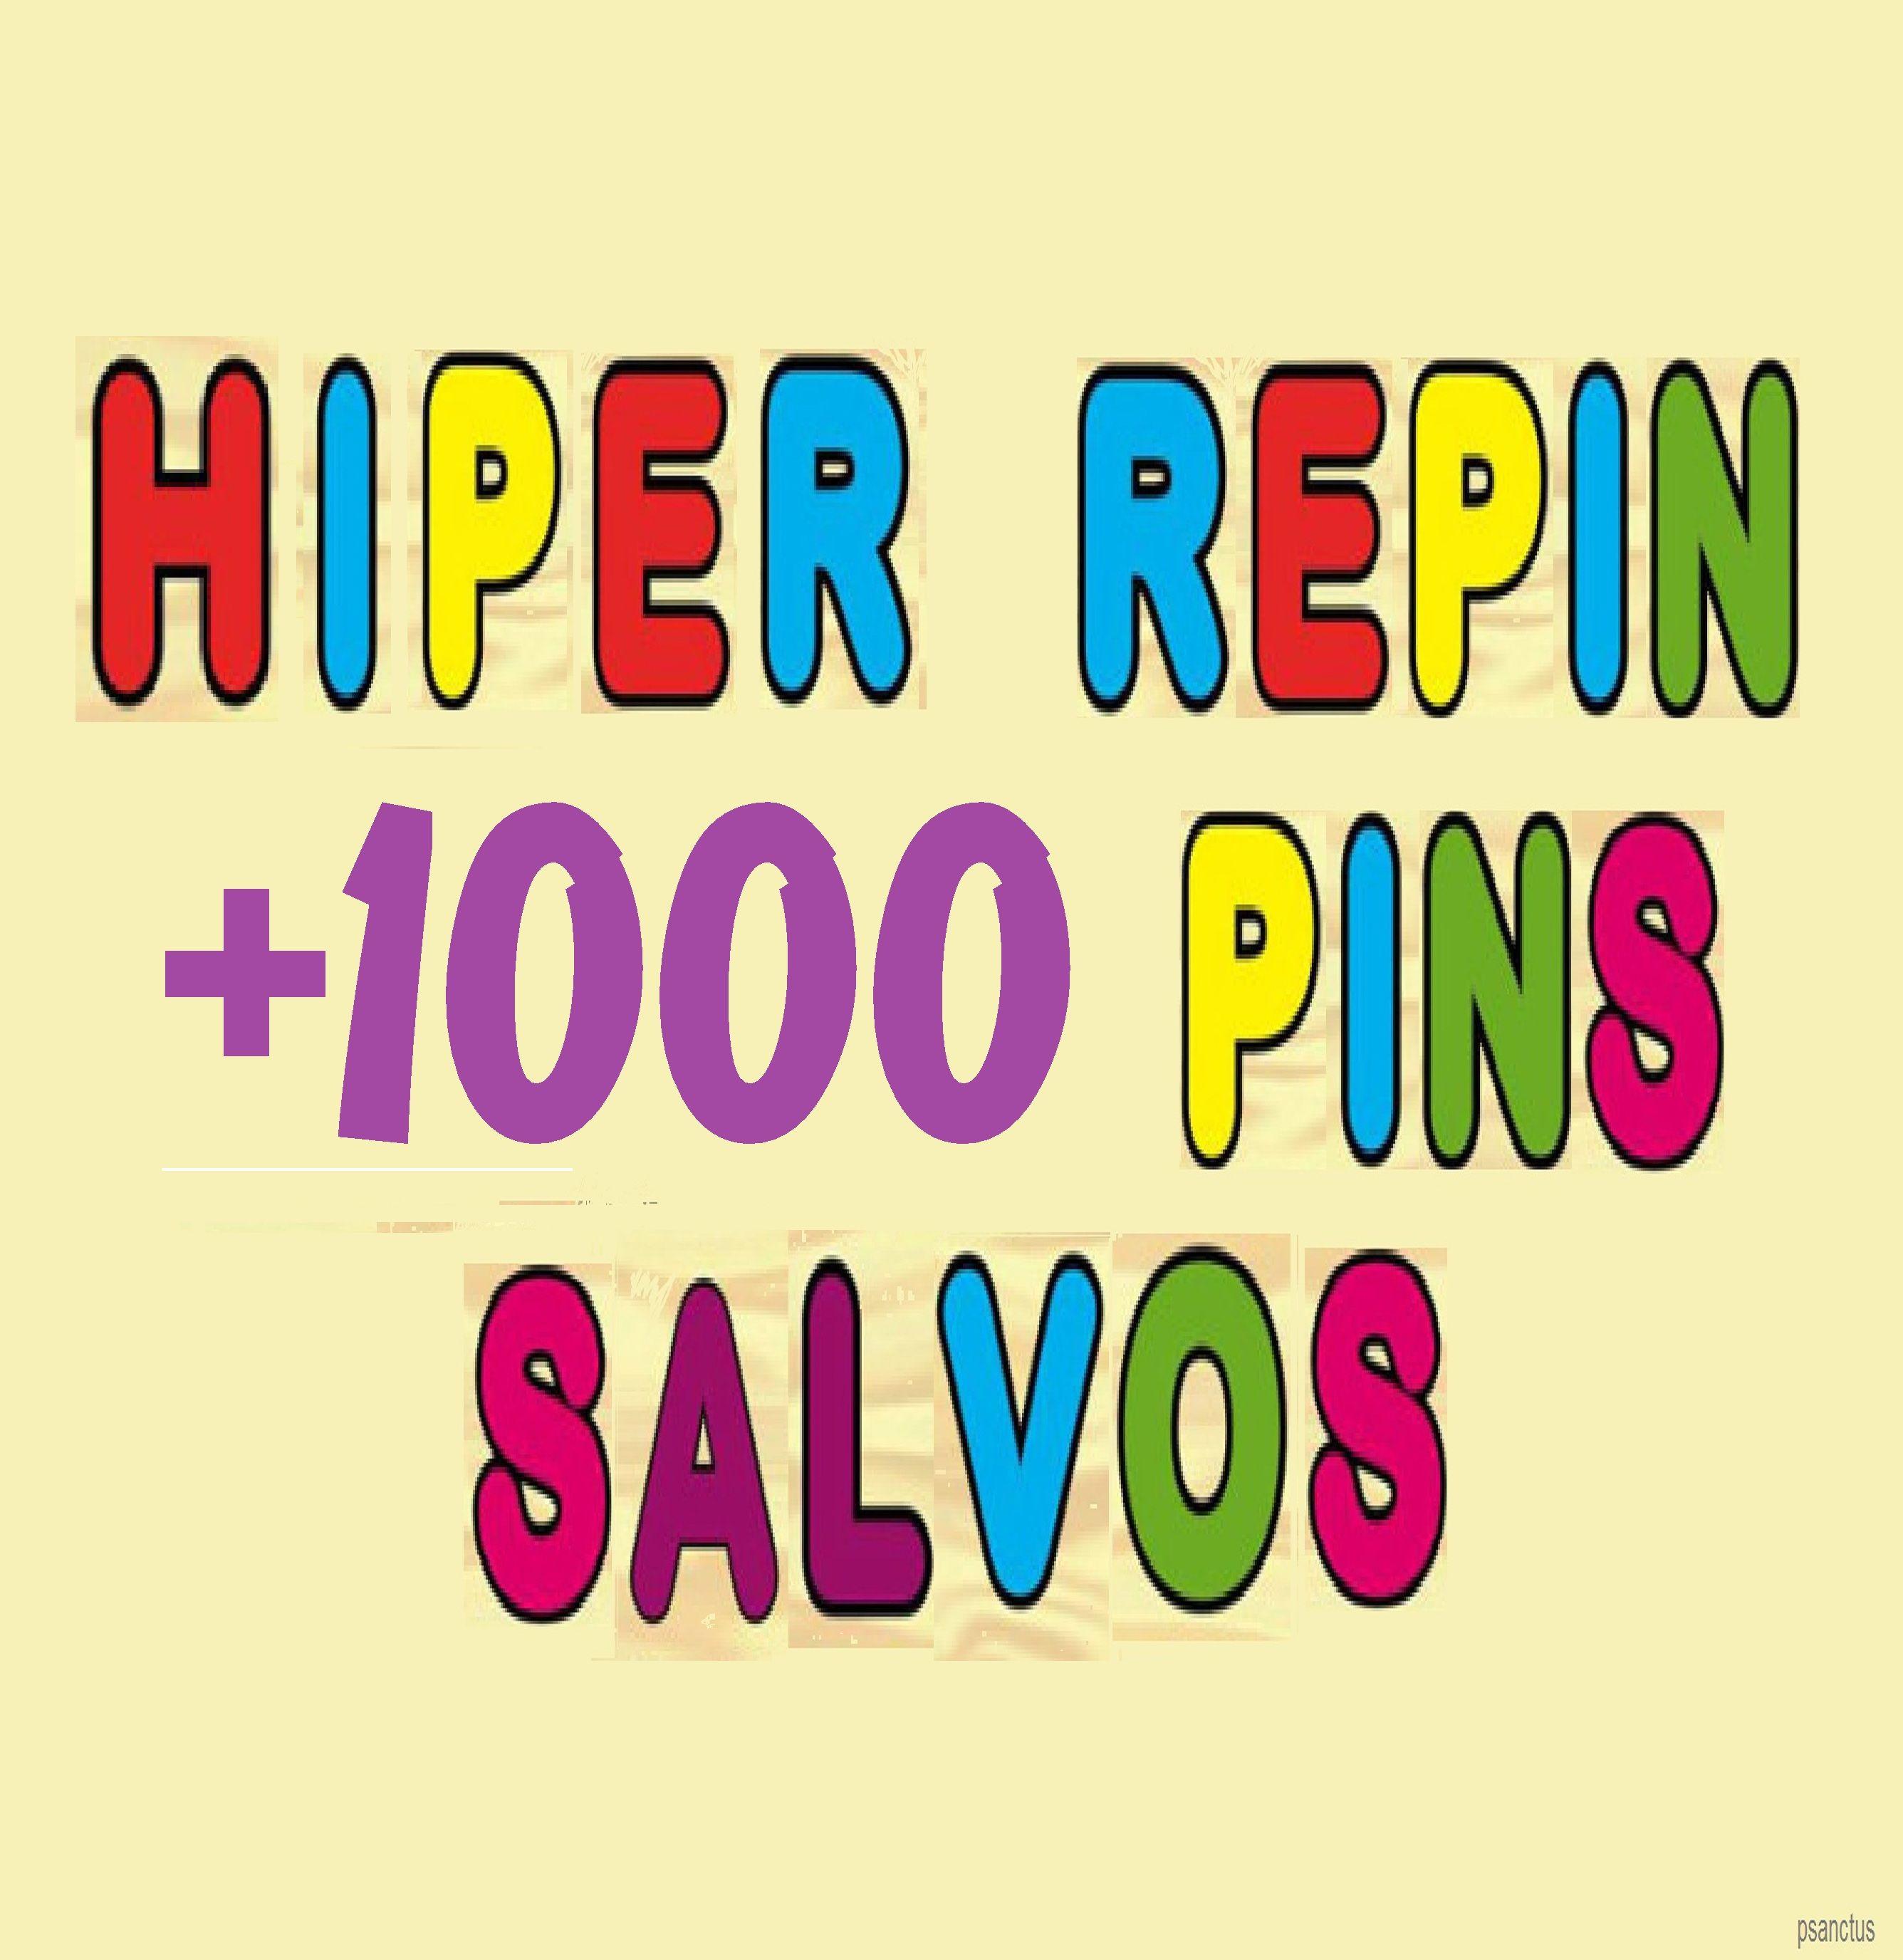 Hiper Repin Beta Repin Juntinhos Tim Beta